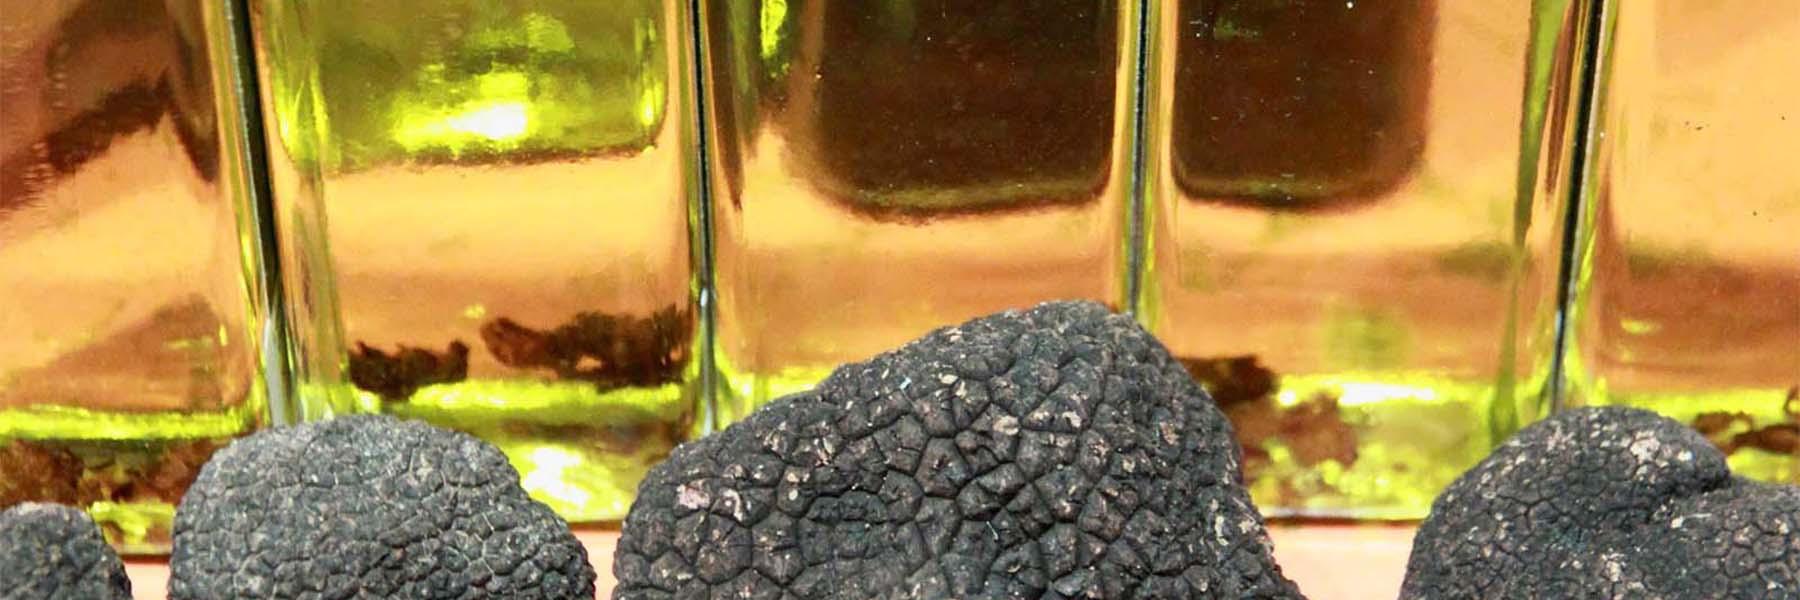 Truffles & Truffle Oils